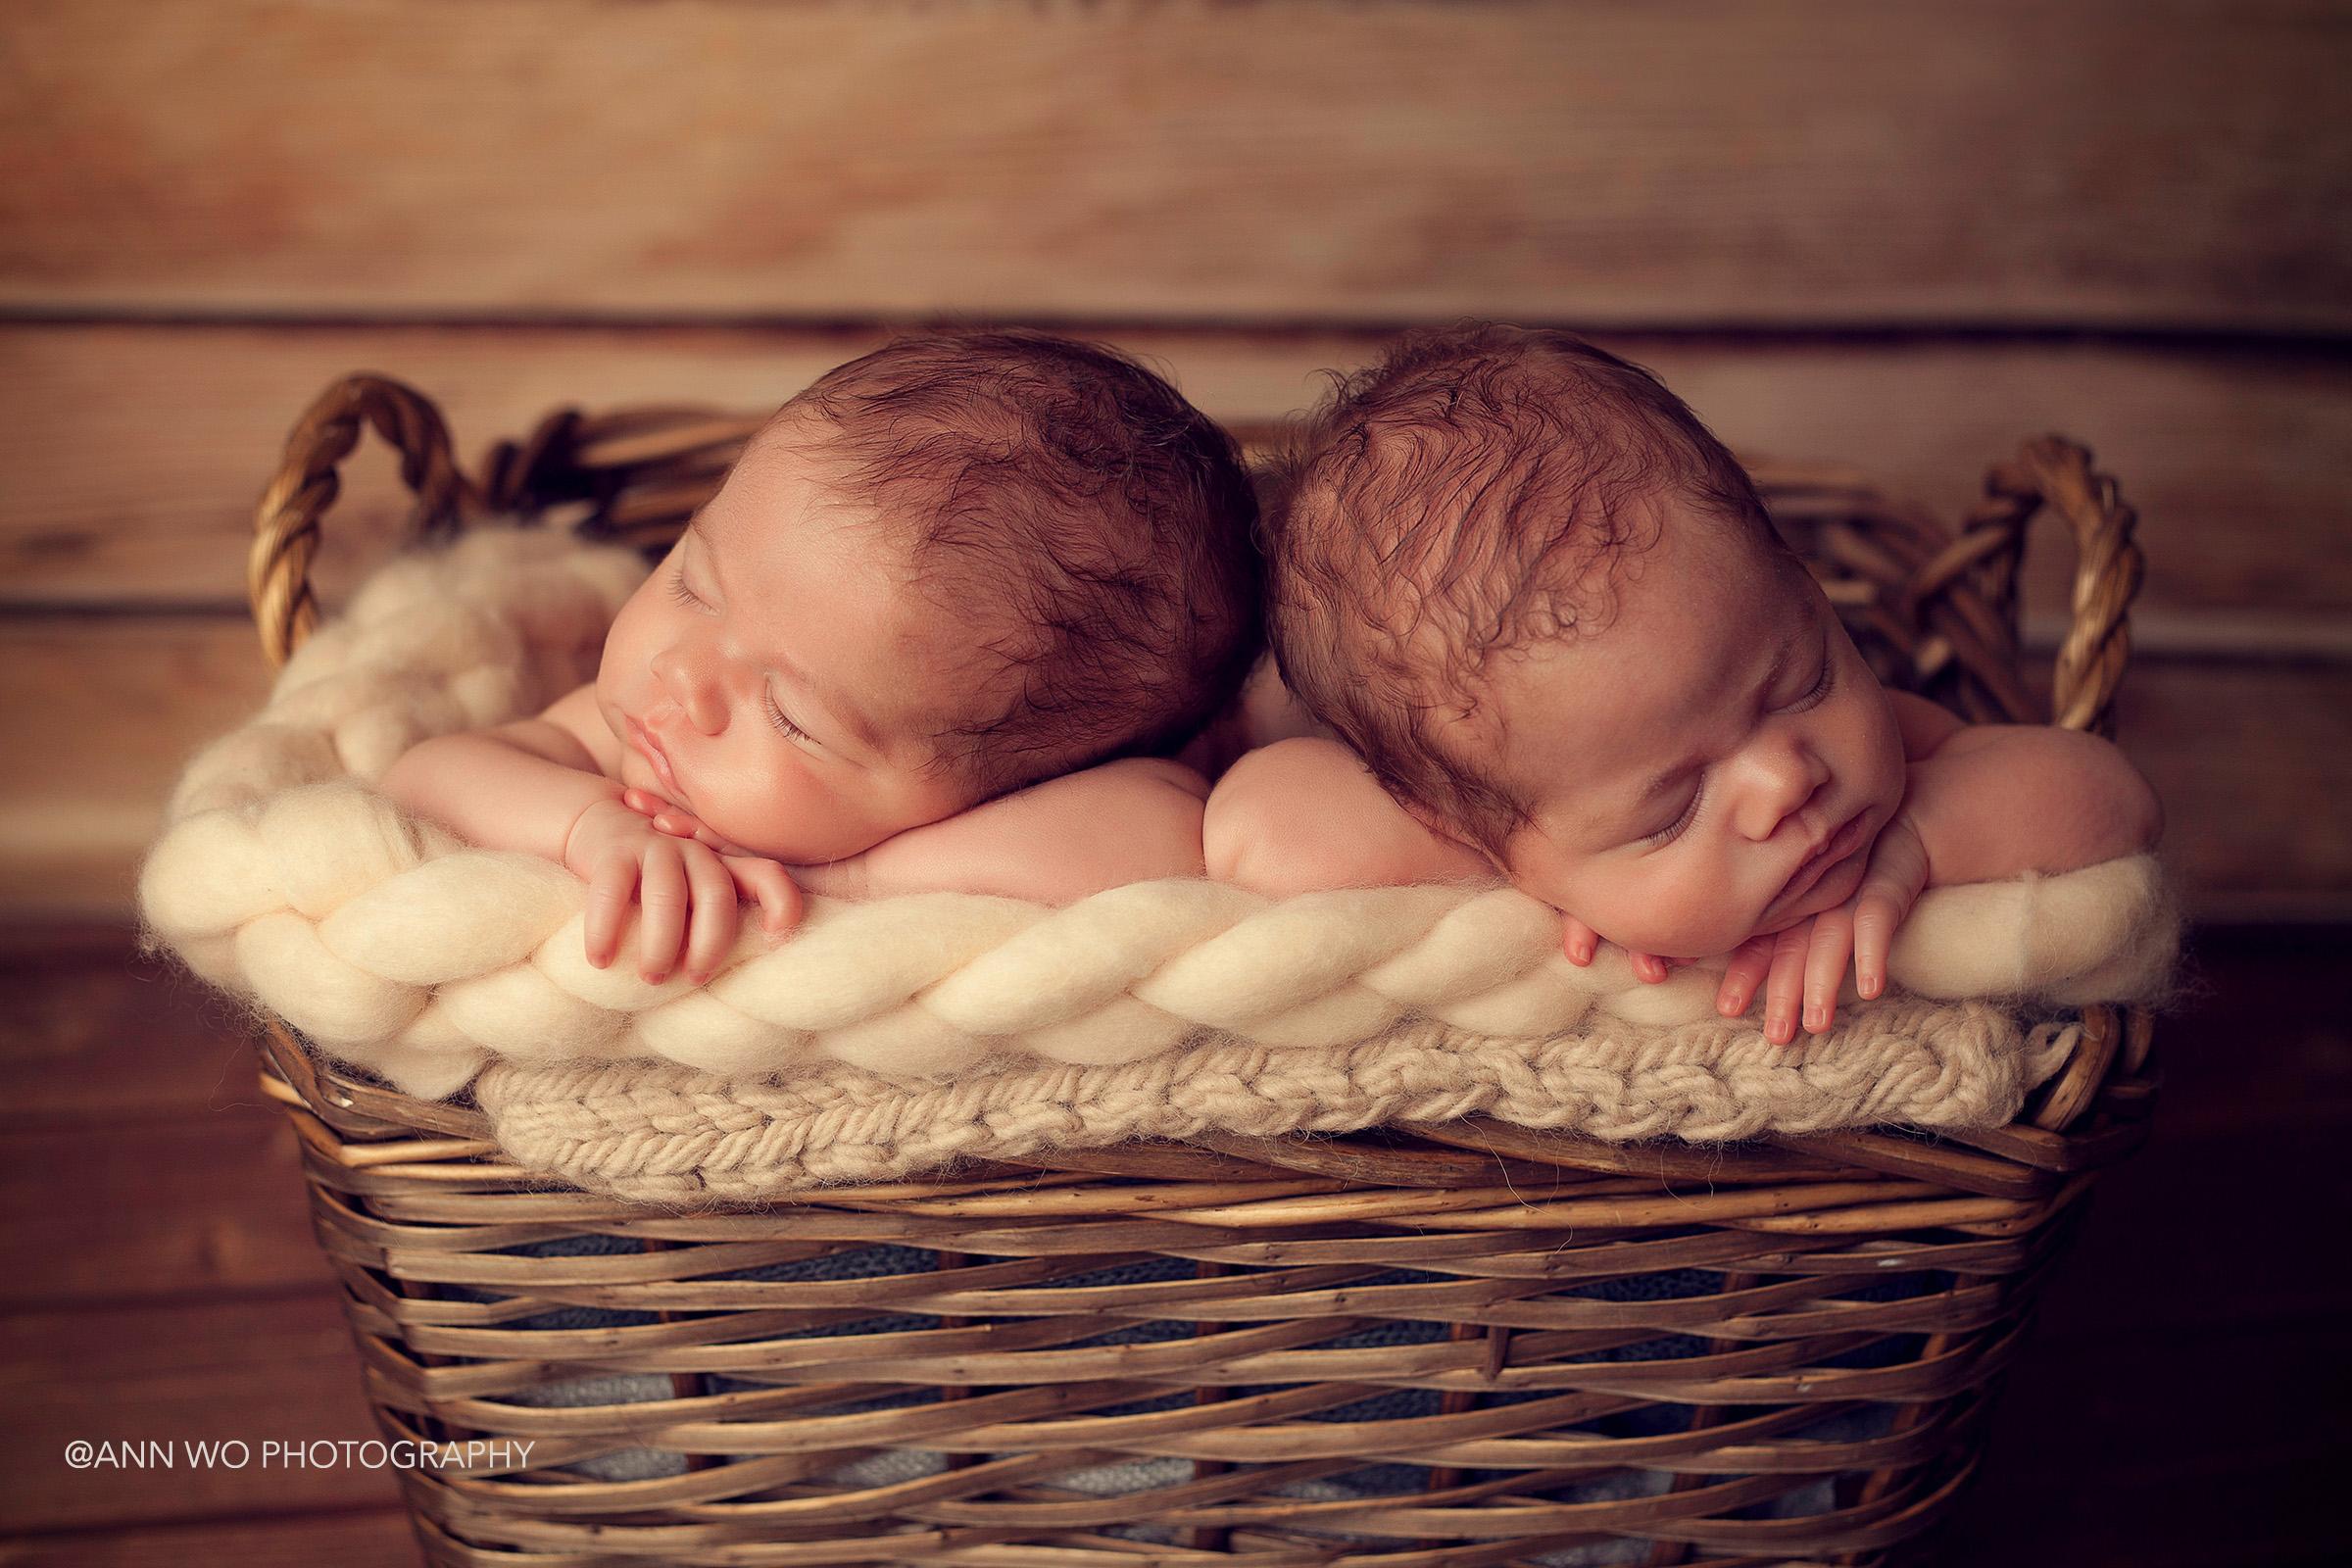 newborn photographer session visit - identical twin sisters, using big basket